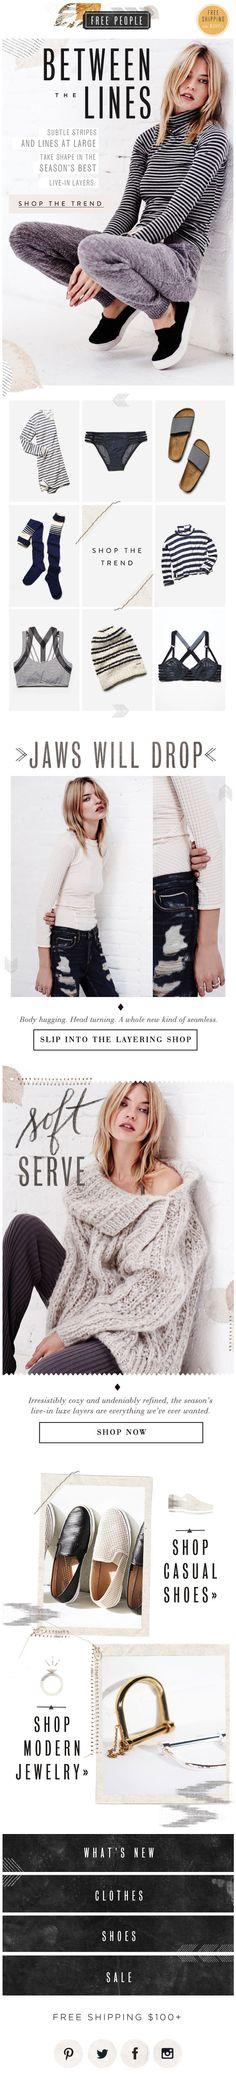 Free People : Grid + Trend Page Design, Book Design, Layout Design, Web Design, Newsletter Layout, Newsletter Design, Lookbook Layout, Email Design Inspiration, Fashion Banner